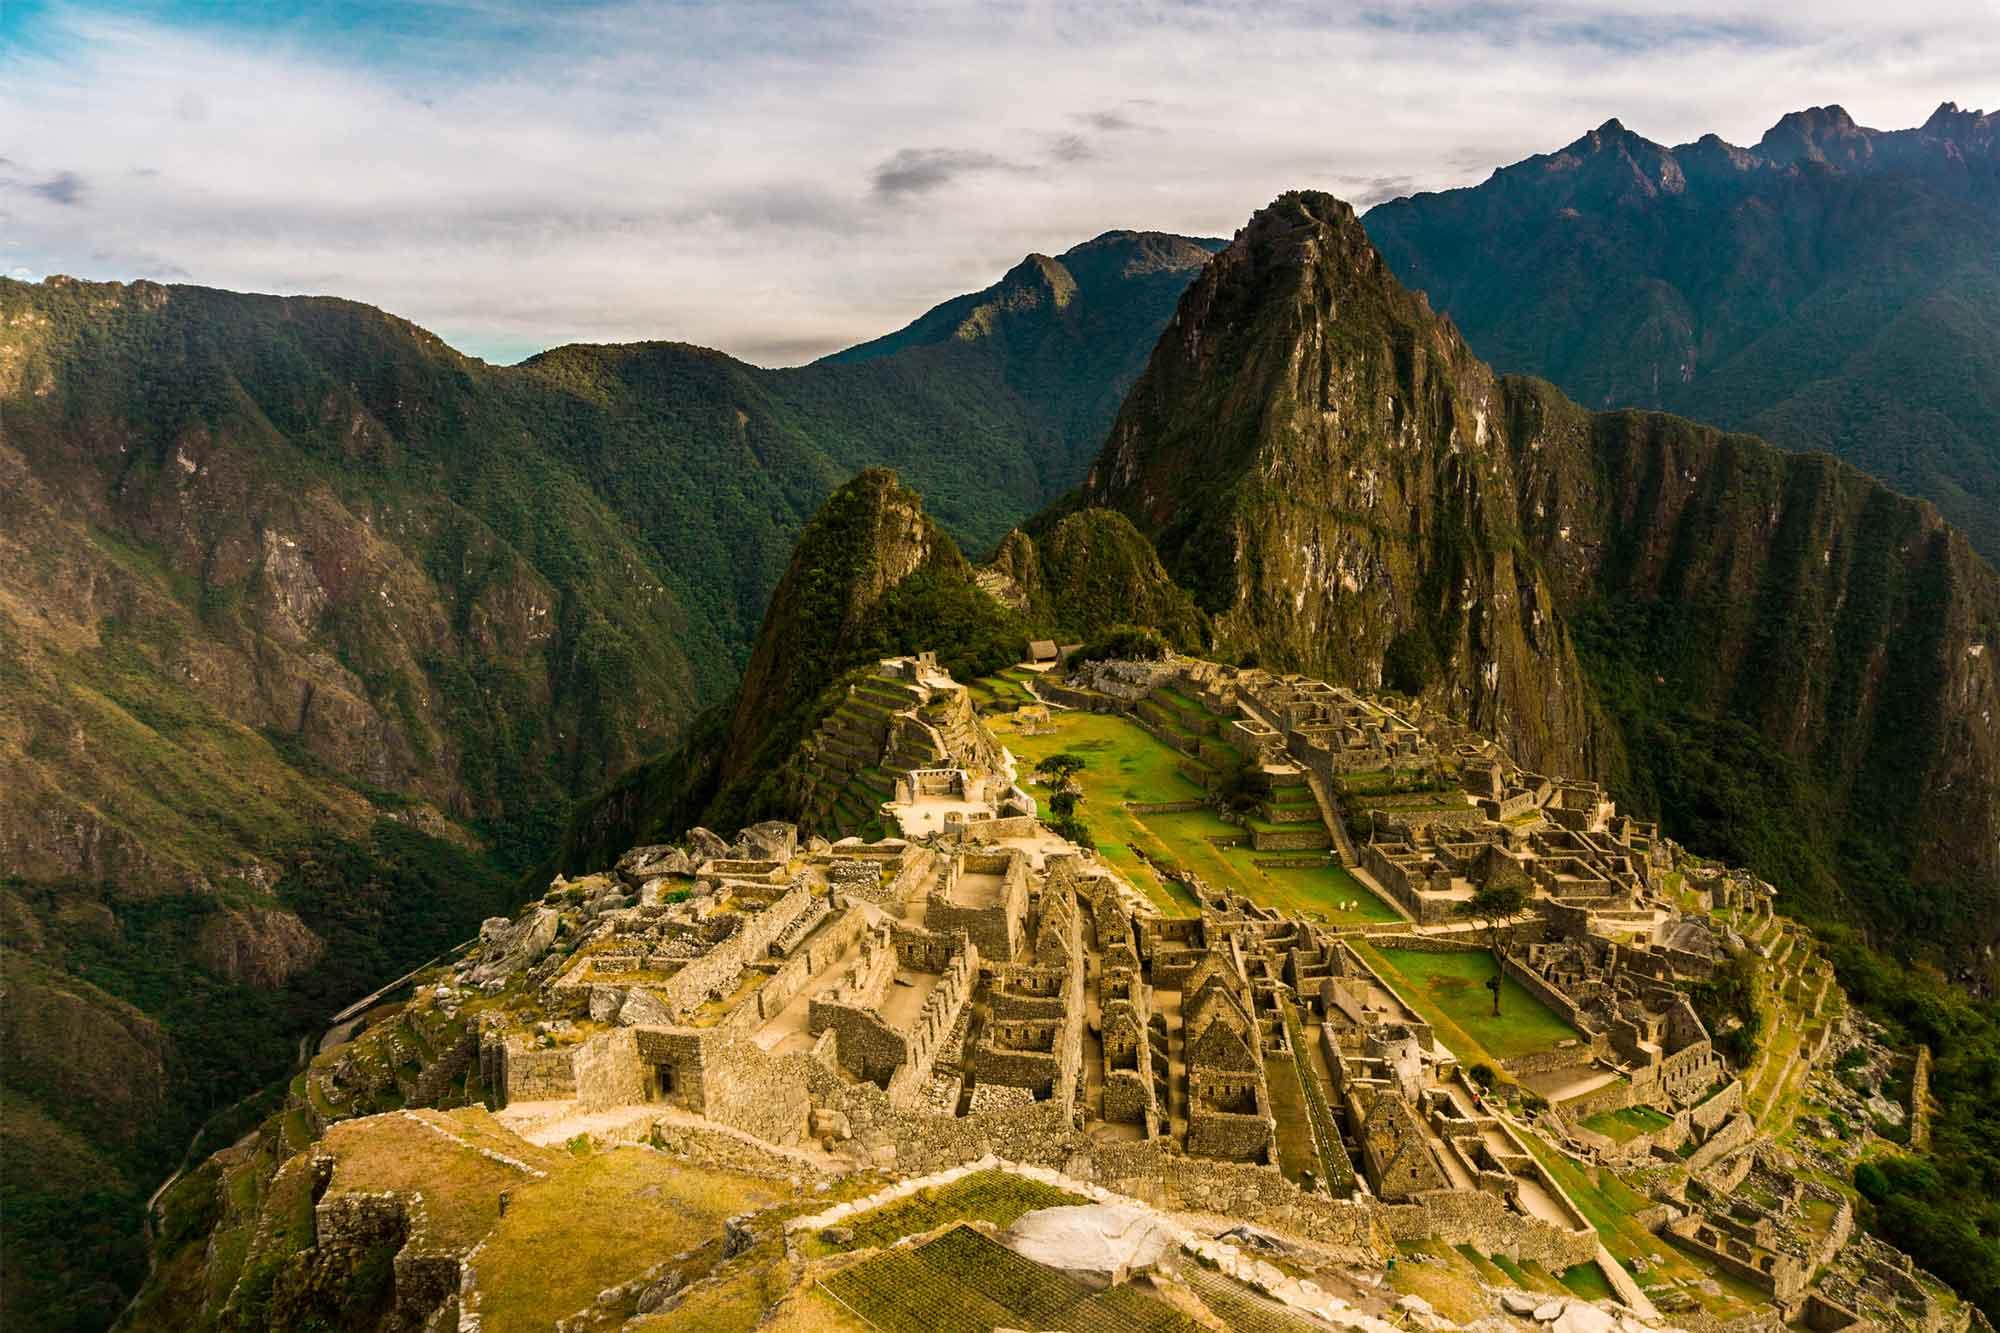 Machu Picchu Travel Guide Visiting The Incan Citadel